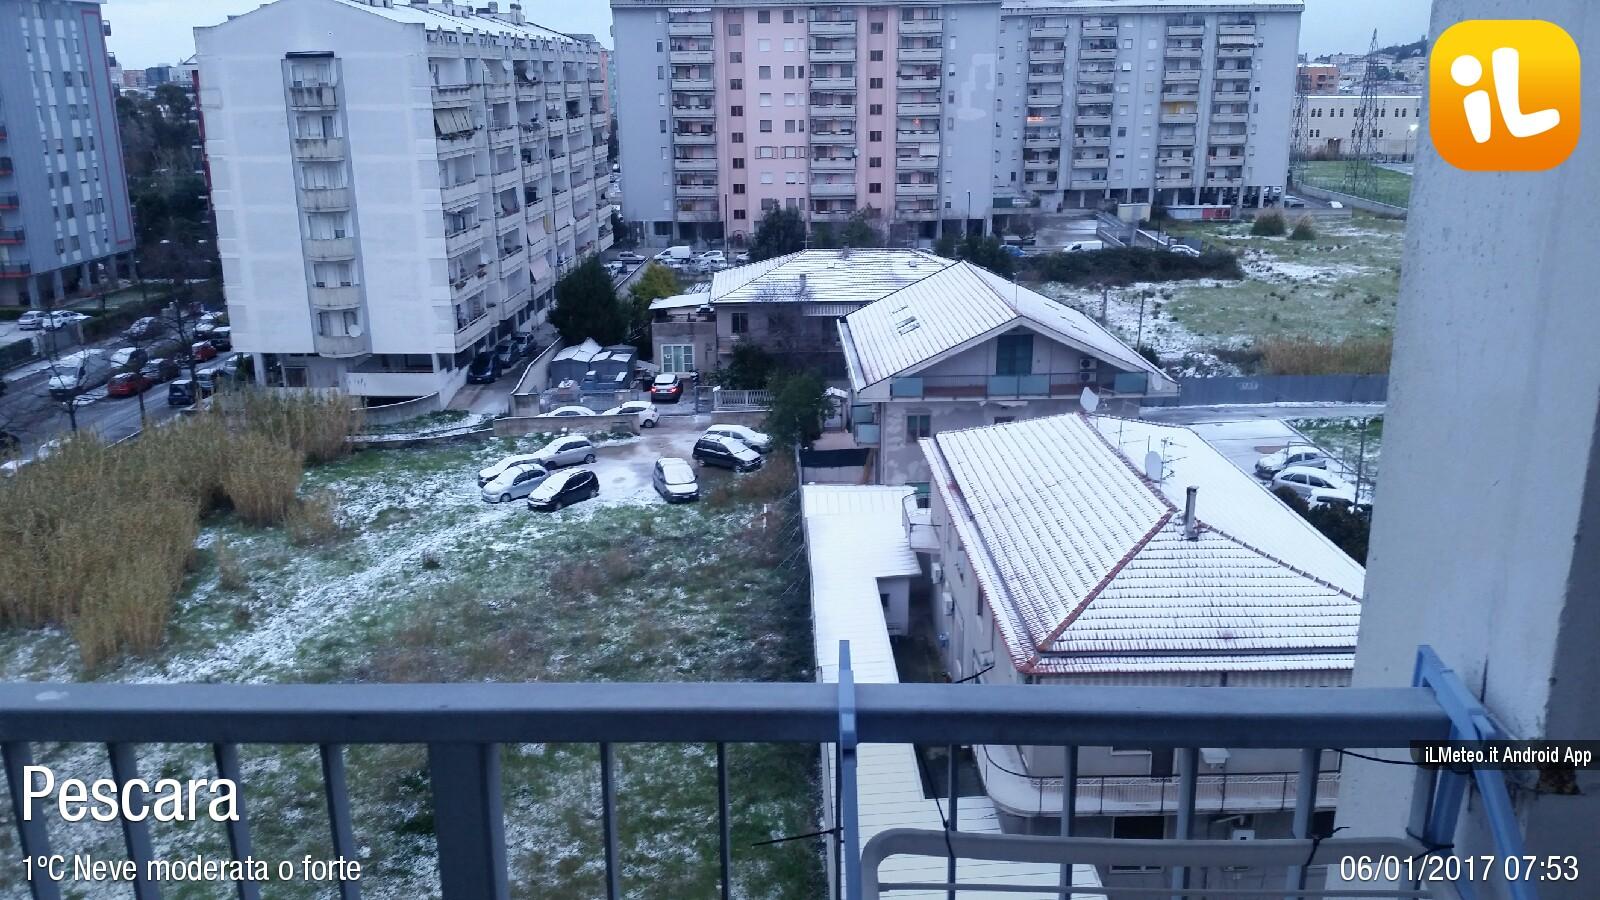 Foto meteo - Pescara - Pescara ore 7:53 » ILMETEO.it